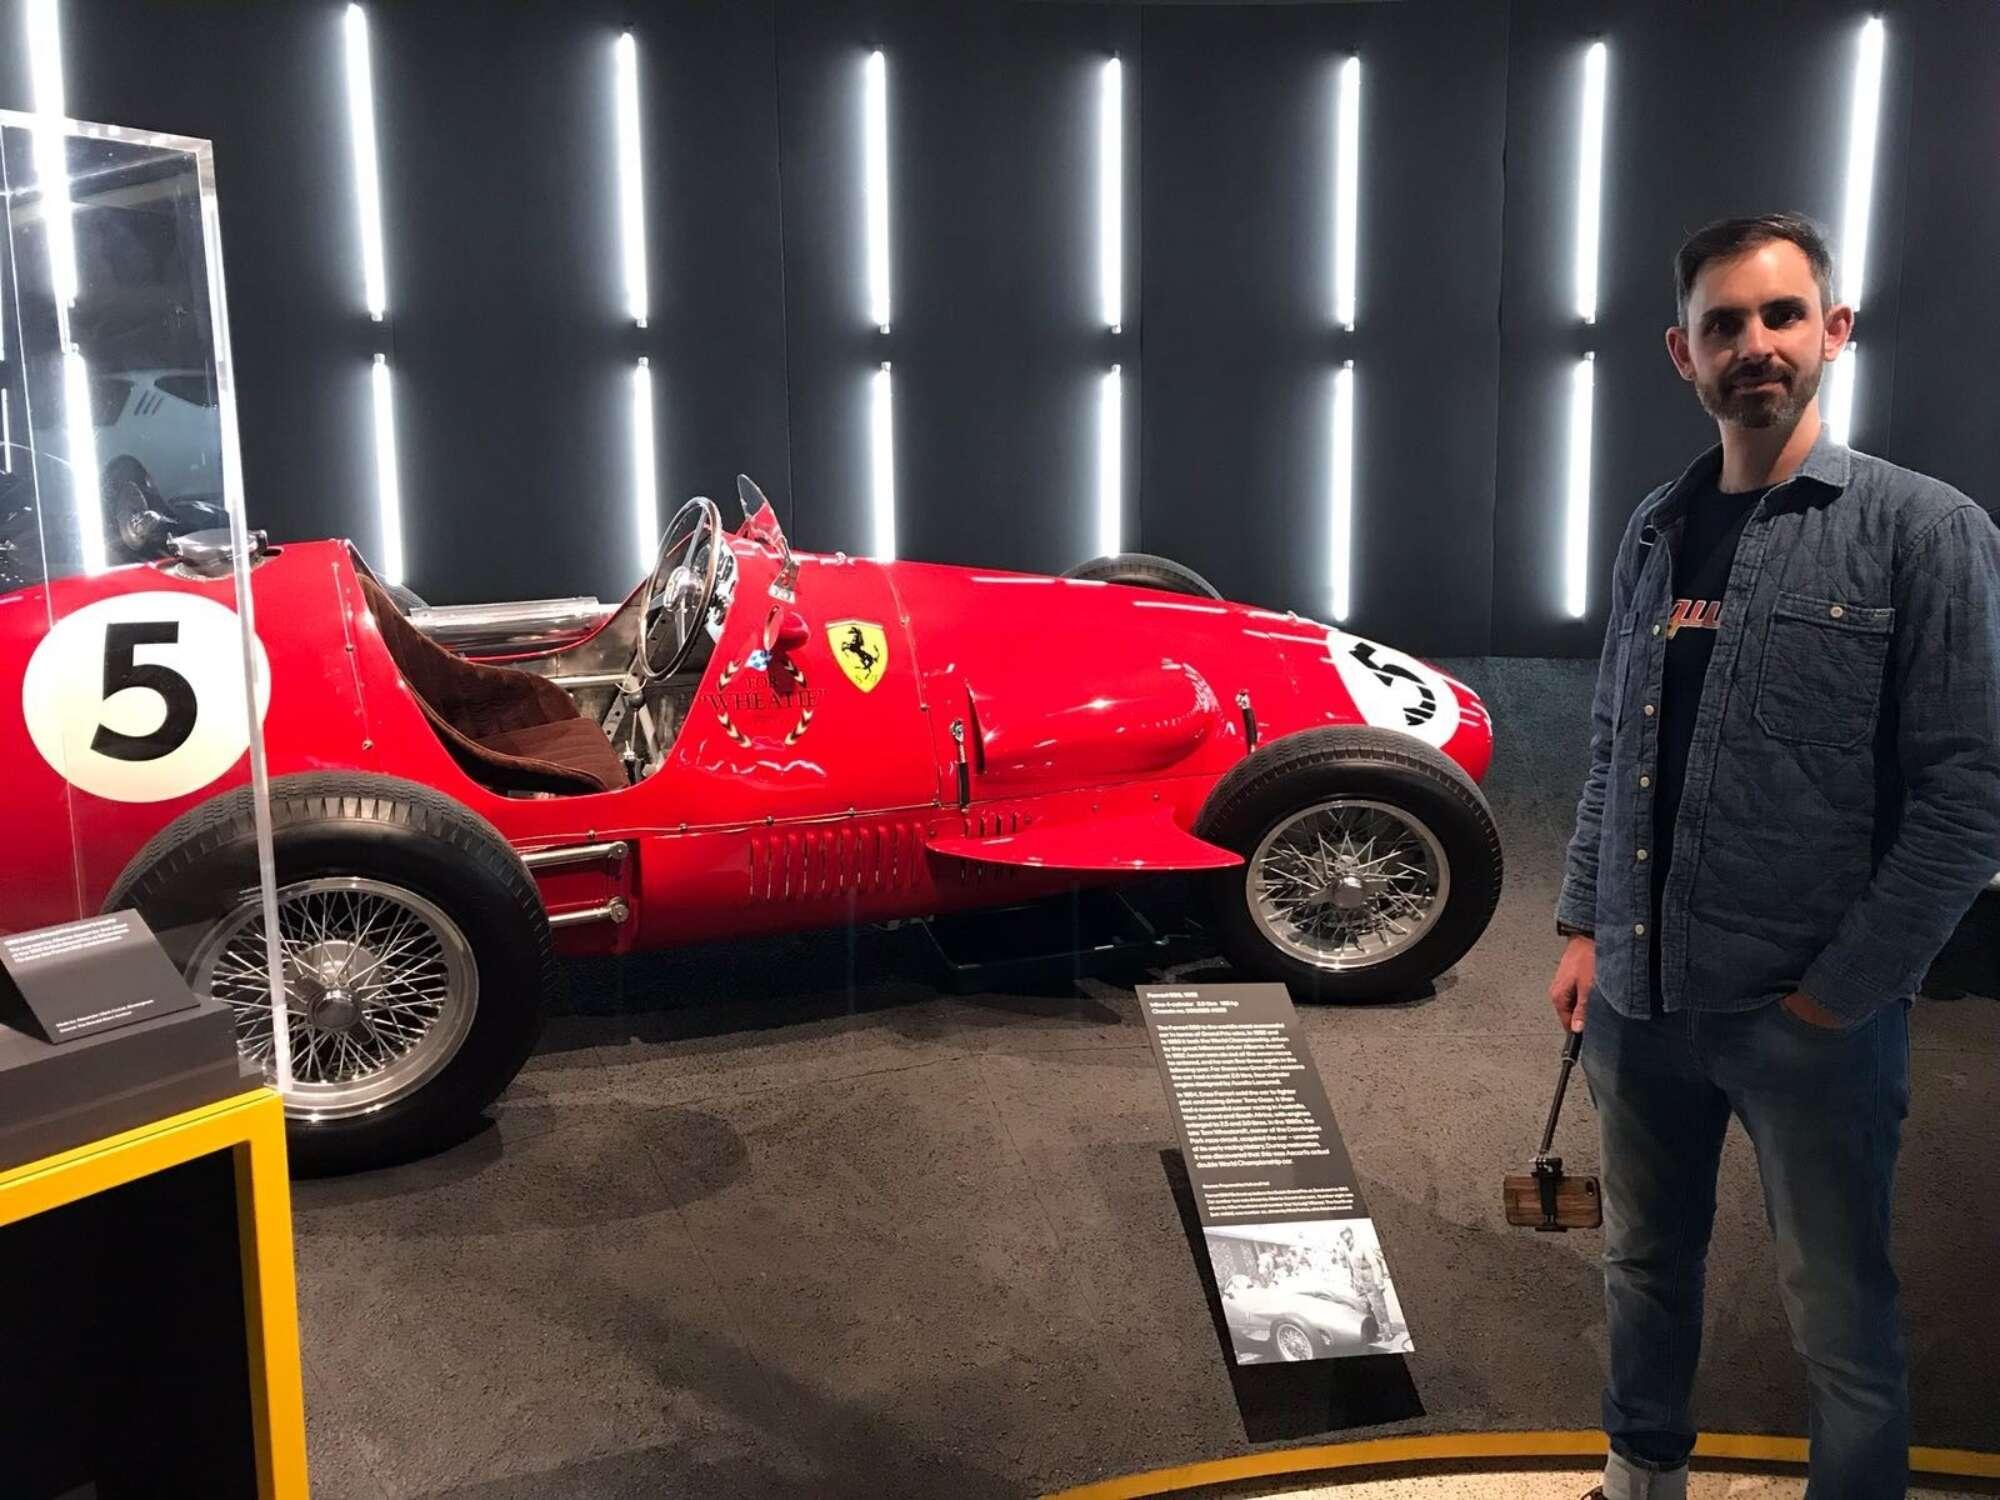 Ferrari Exhib No 5 Red